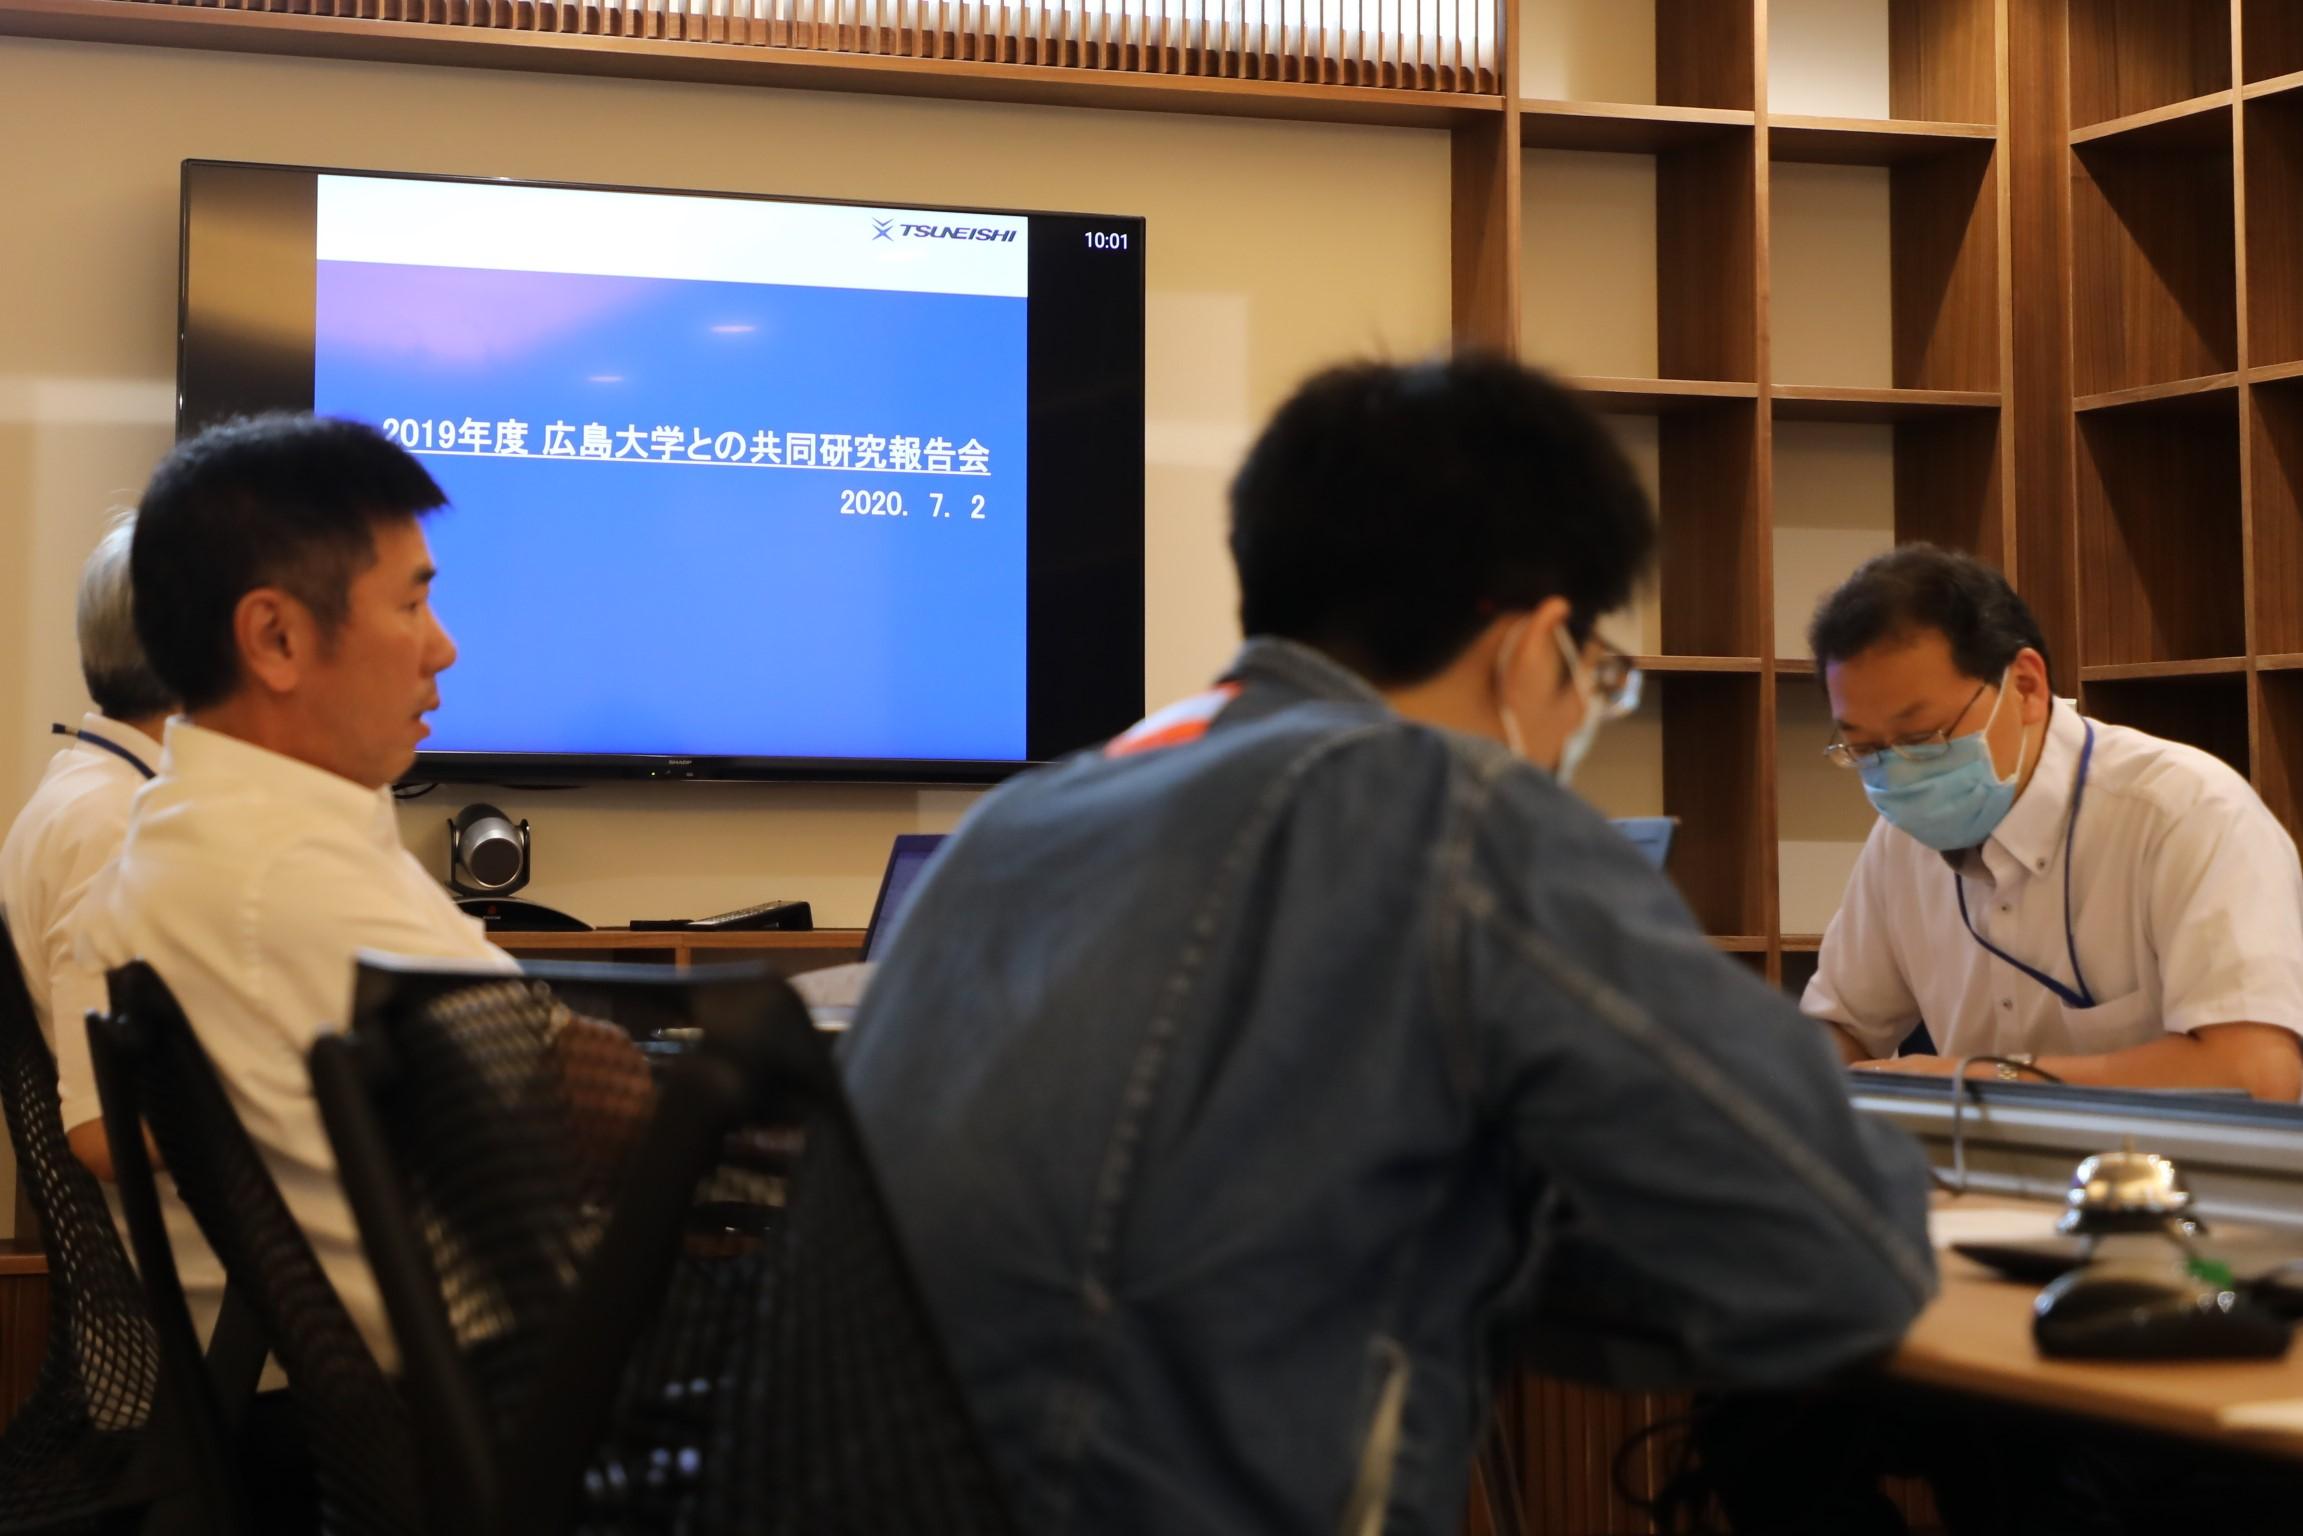 常石造船 広島大学との2019年度 共同研究成果報告会を開催  ~環境負荷低減と顧客価値向上へ~